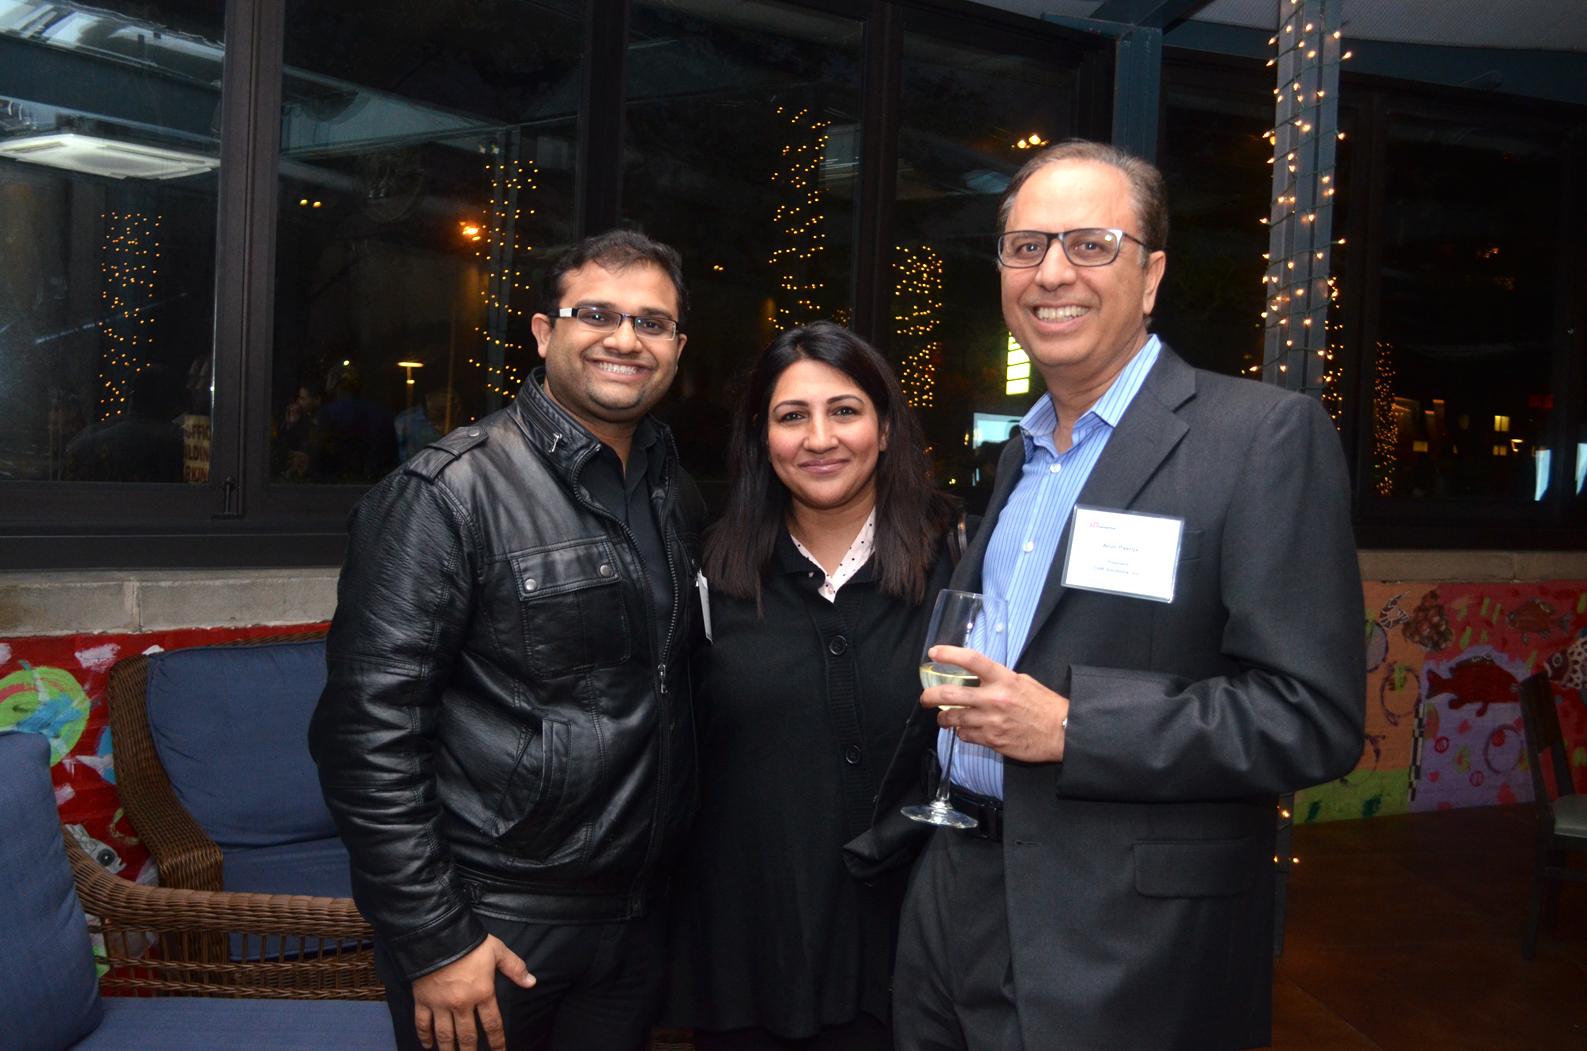 From Left to Right: Ravi Brahmbhatt, TiE Houston Board and Charter member, Sehar Javed, TiE Houston member and Dr. Arun Pasrija, TiE Houston President.